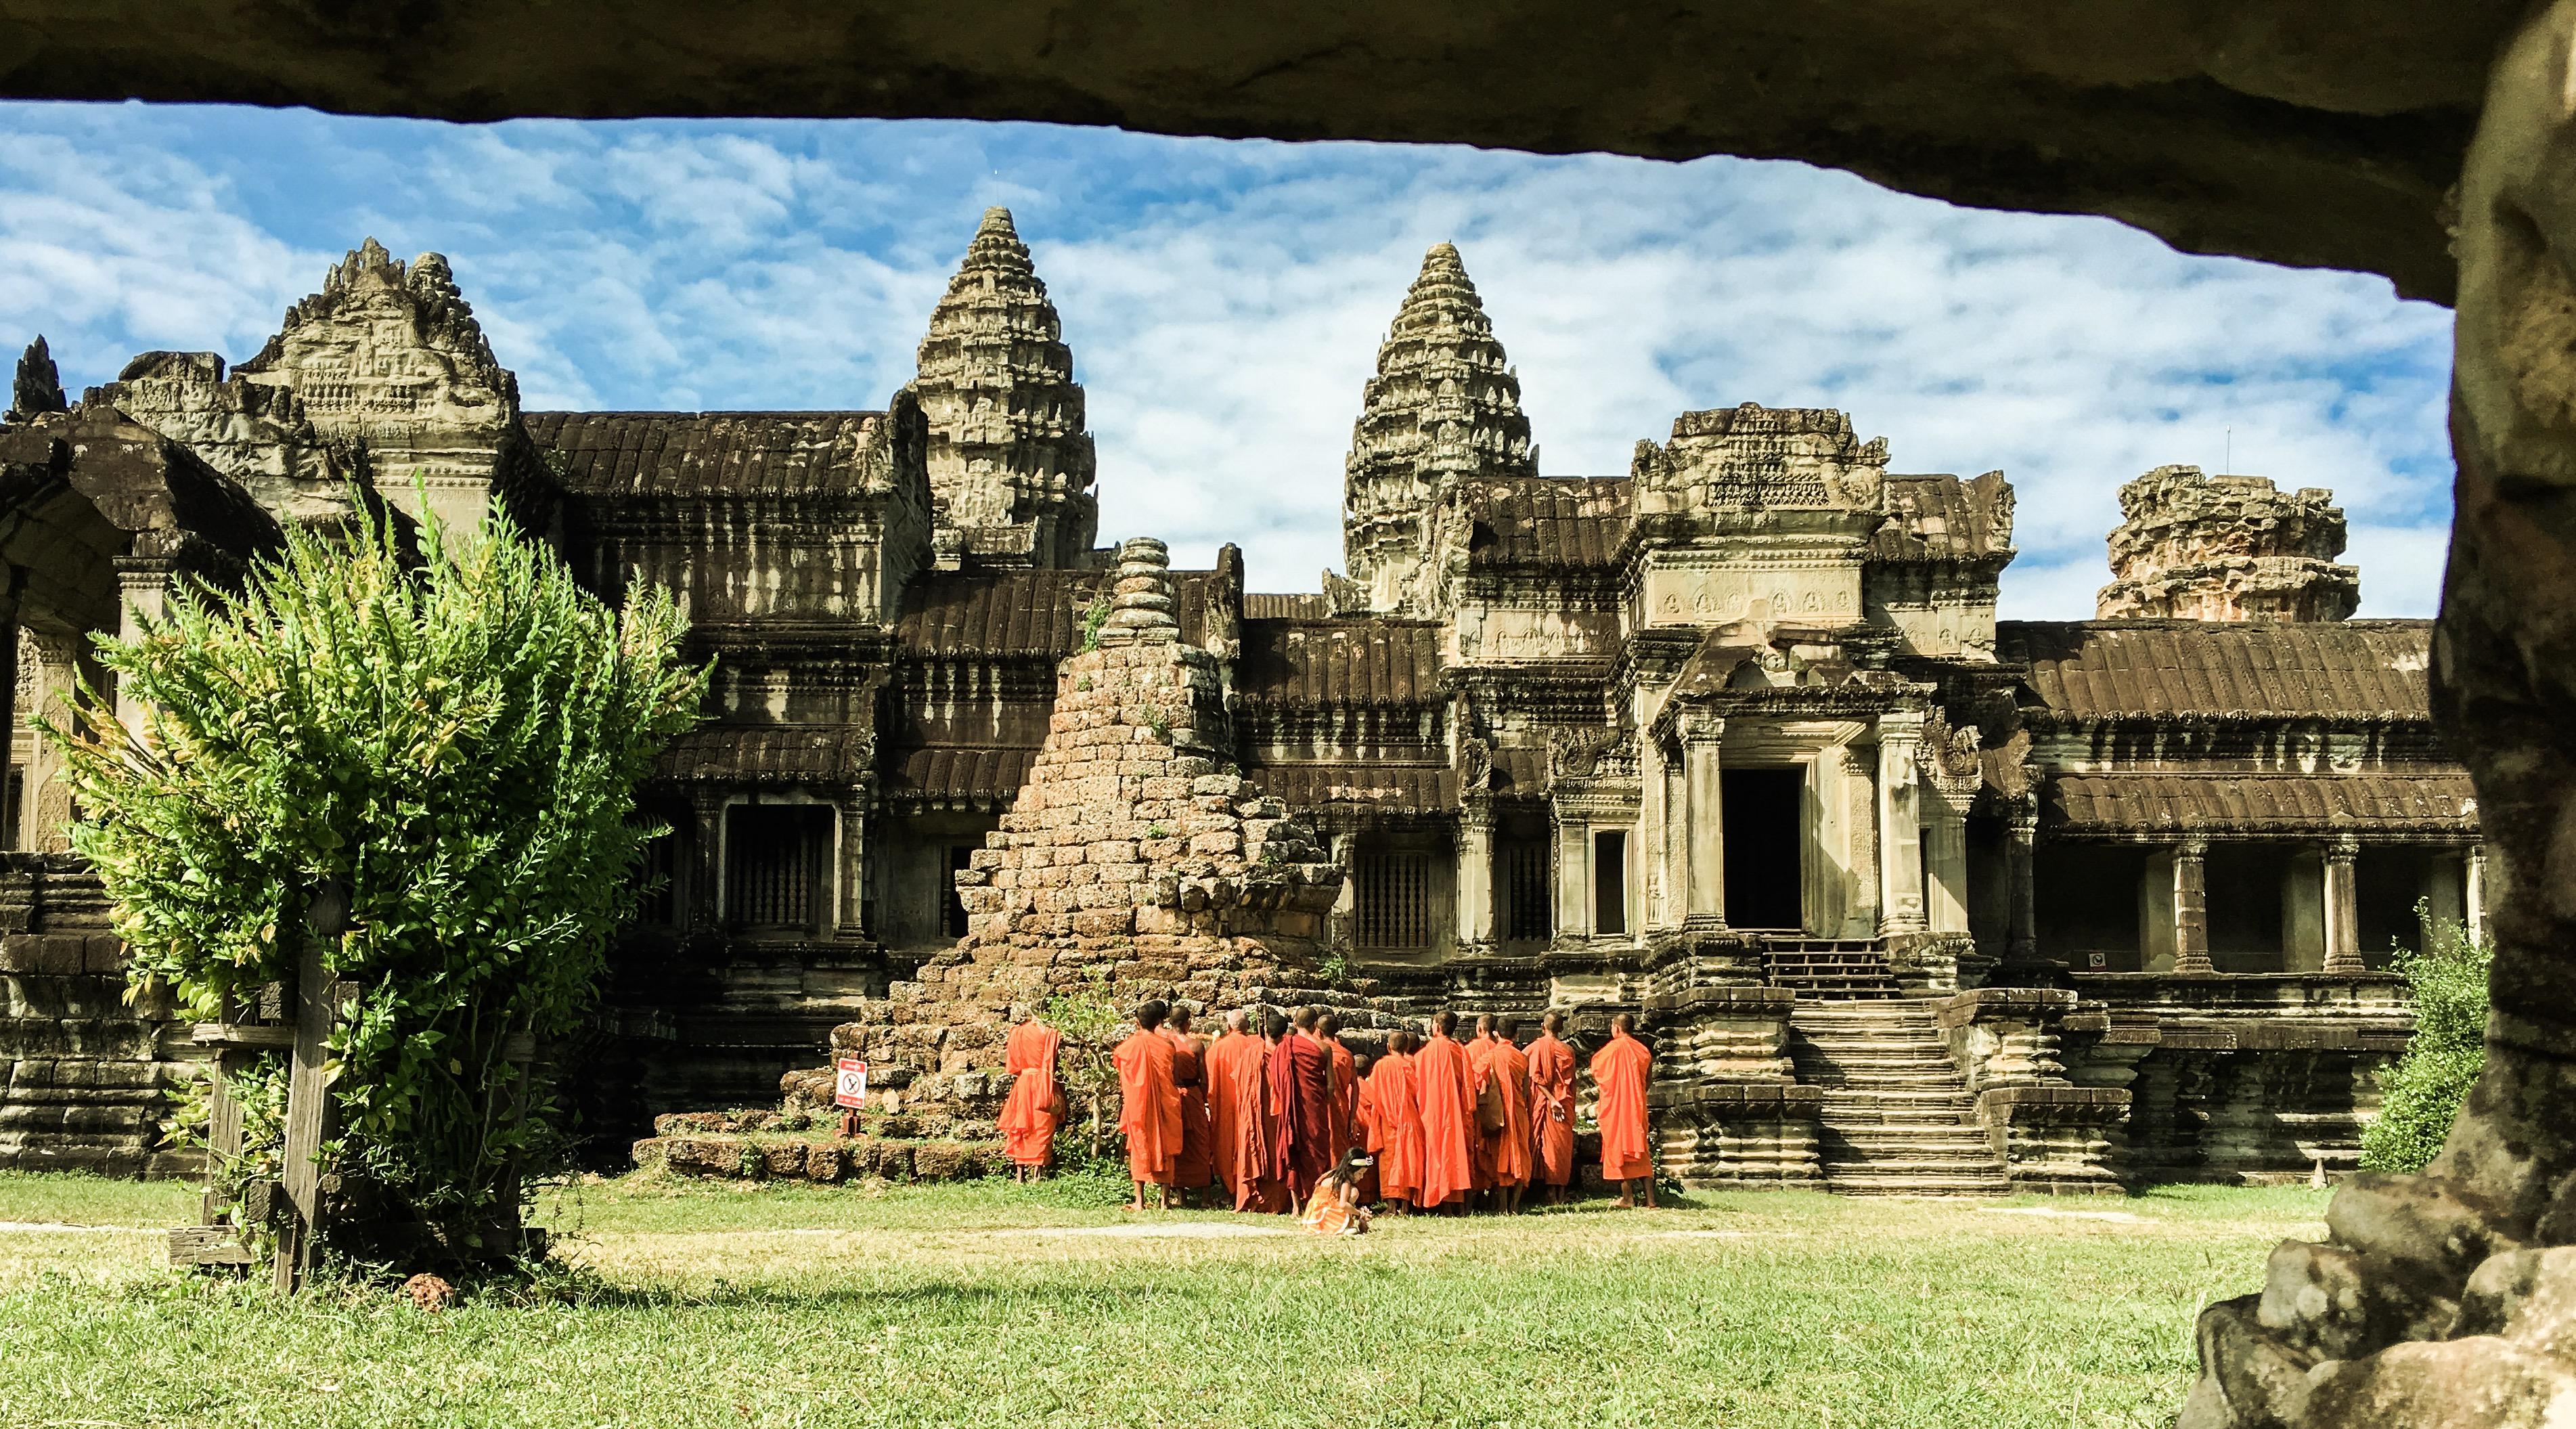 Angkor Wat, Cambodia, December 2016